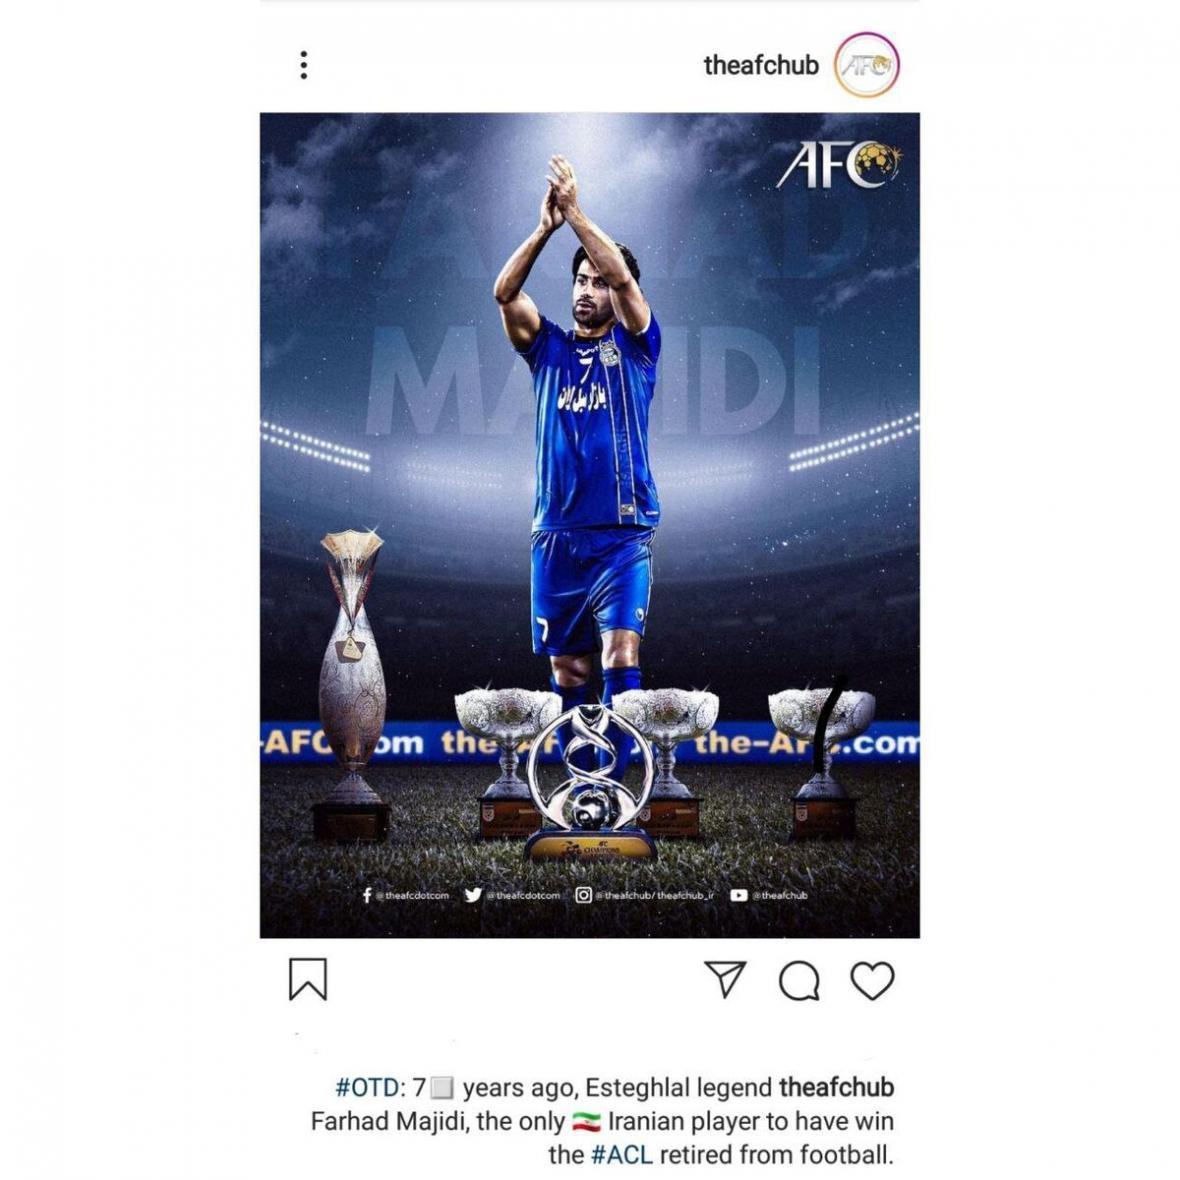 AFC به مناسبت سالروز خداحافظی فرهاد مجیدی از فوتبال پستی به اشتراک گذاشت